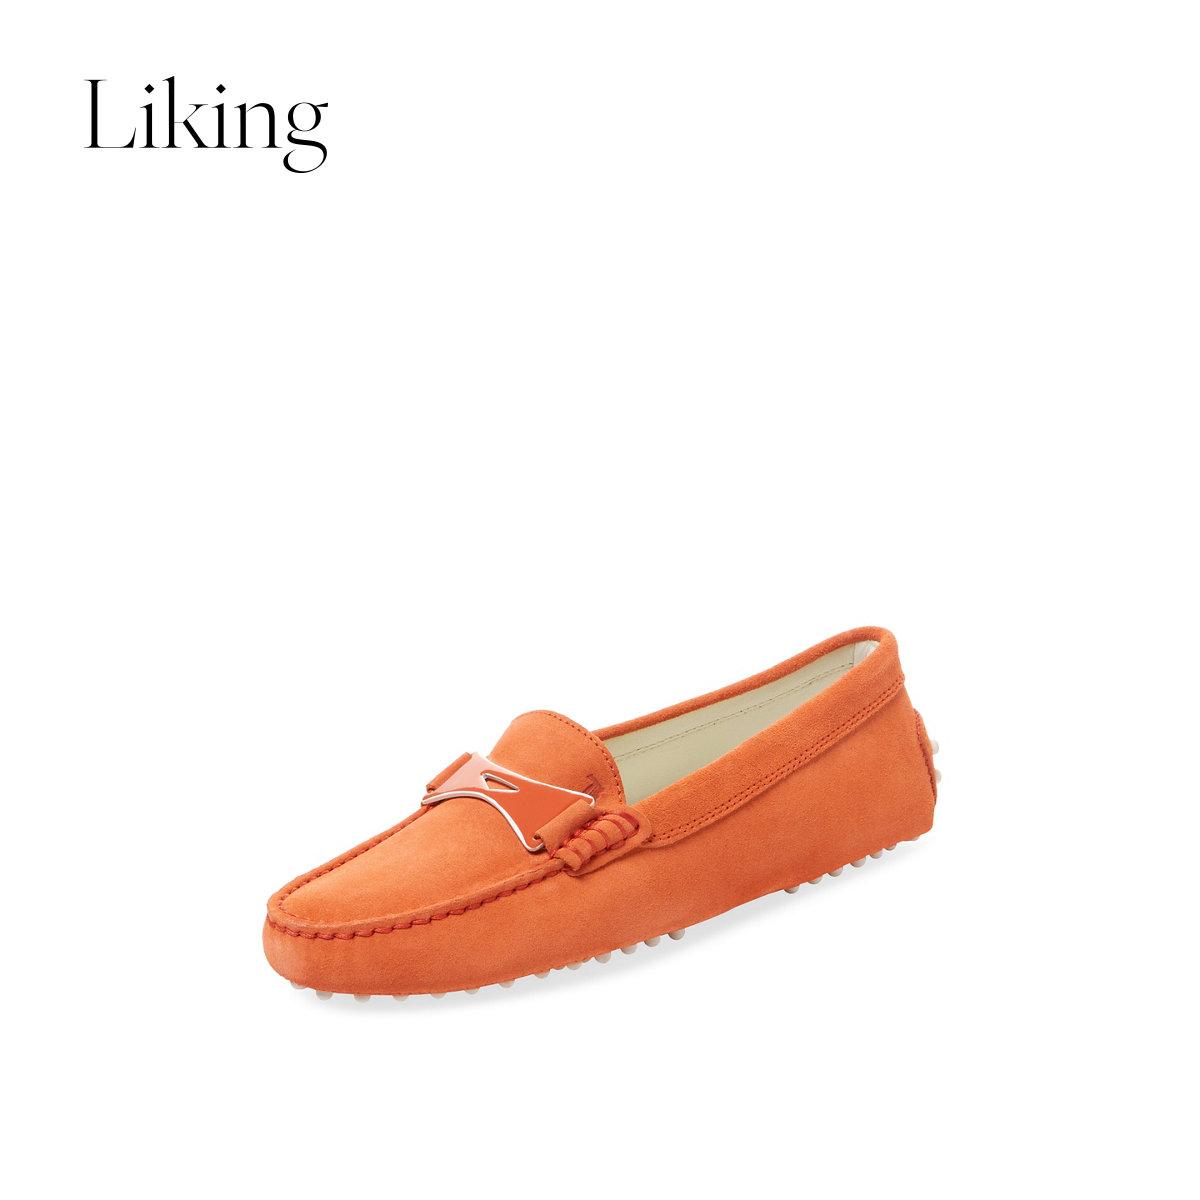 tods豆豆鞋 tods托德斯 女士乐福鞋豆豆鞋_推荐淘宝好看的女tods豆豆鞋